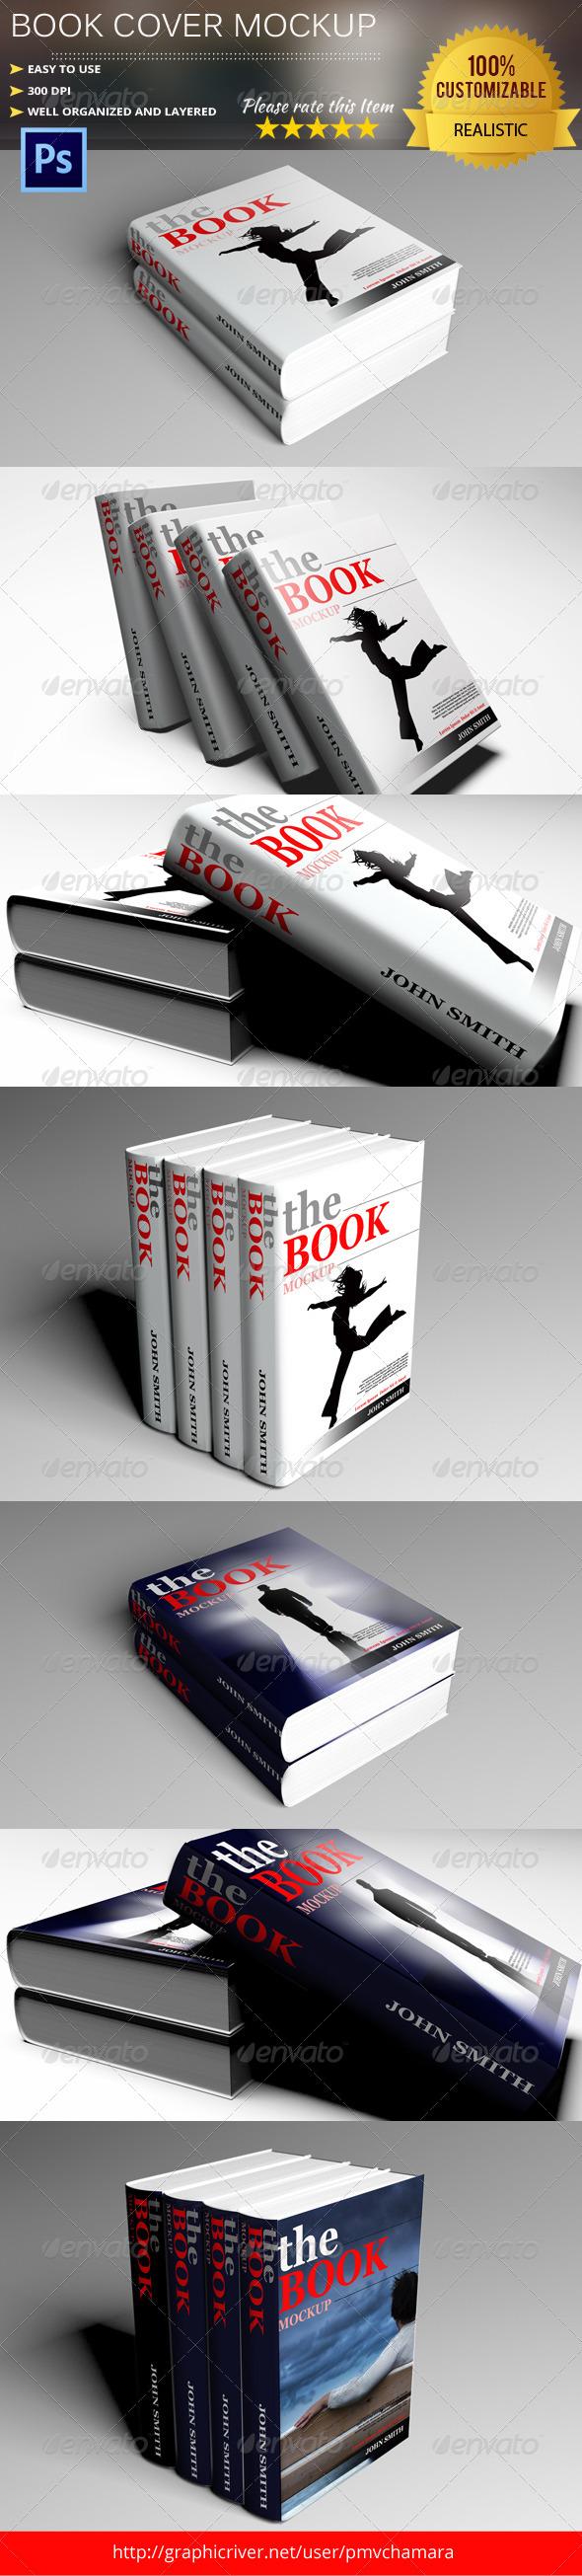 Book Cover Graphicriver : Photorealistic book cover mock up graphicriver